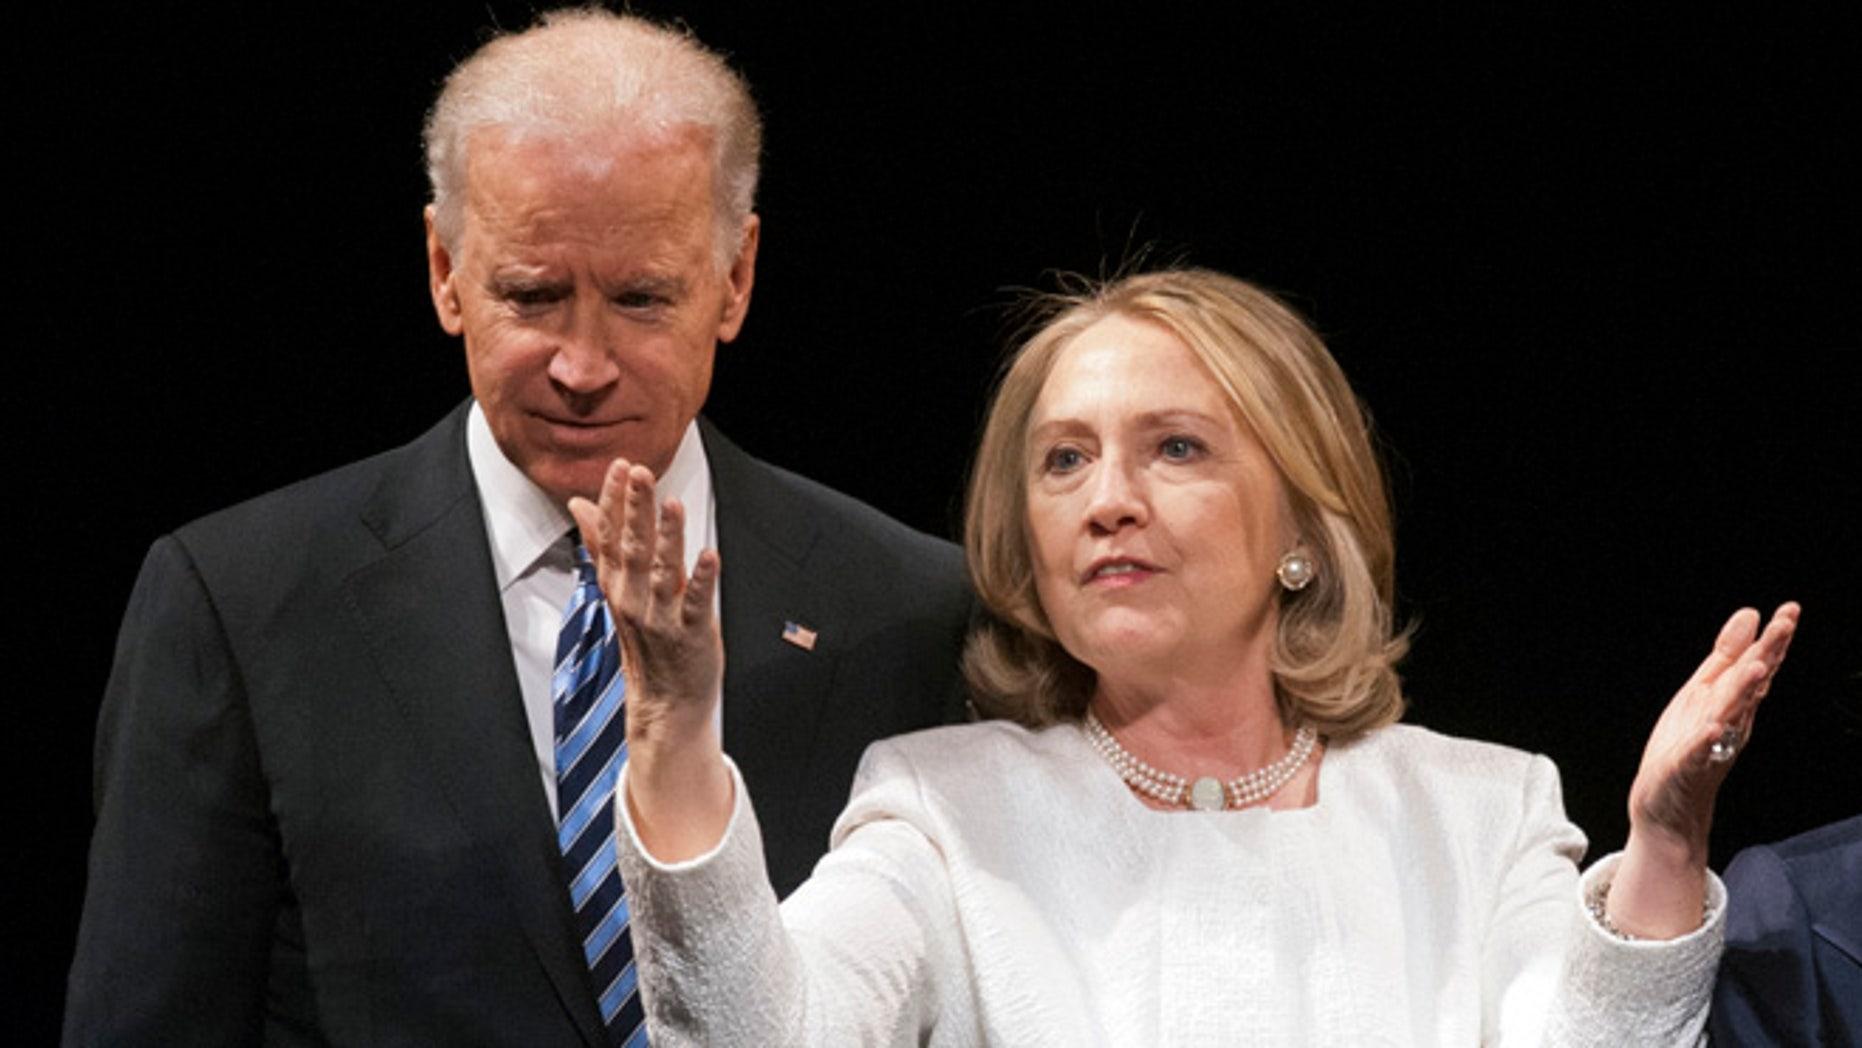 April 2, 2013: Vice President Joe Biden and former Secretary of State Hillary Rodham Clinton are seen in Washington.